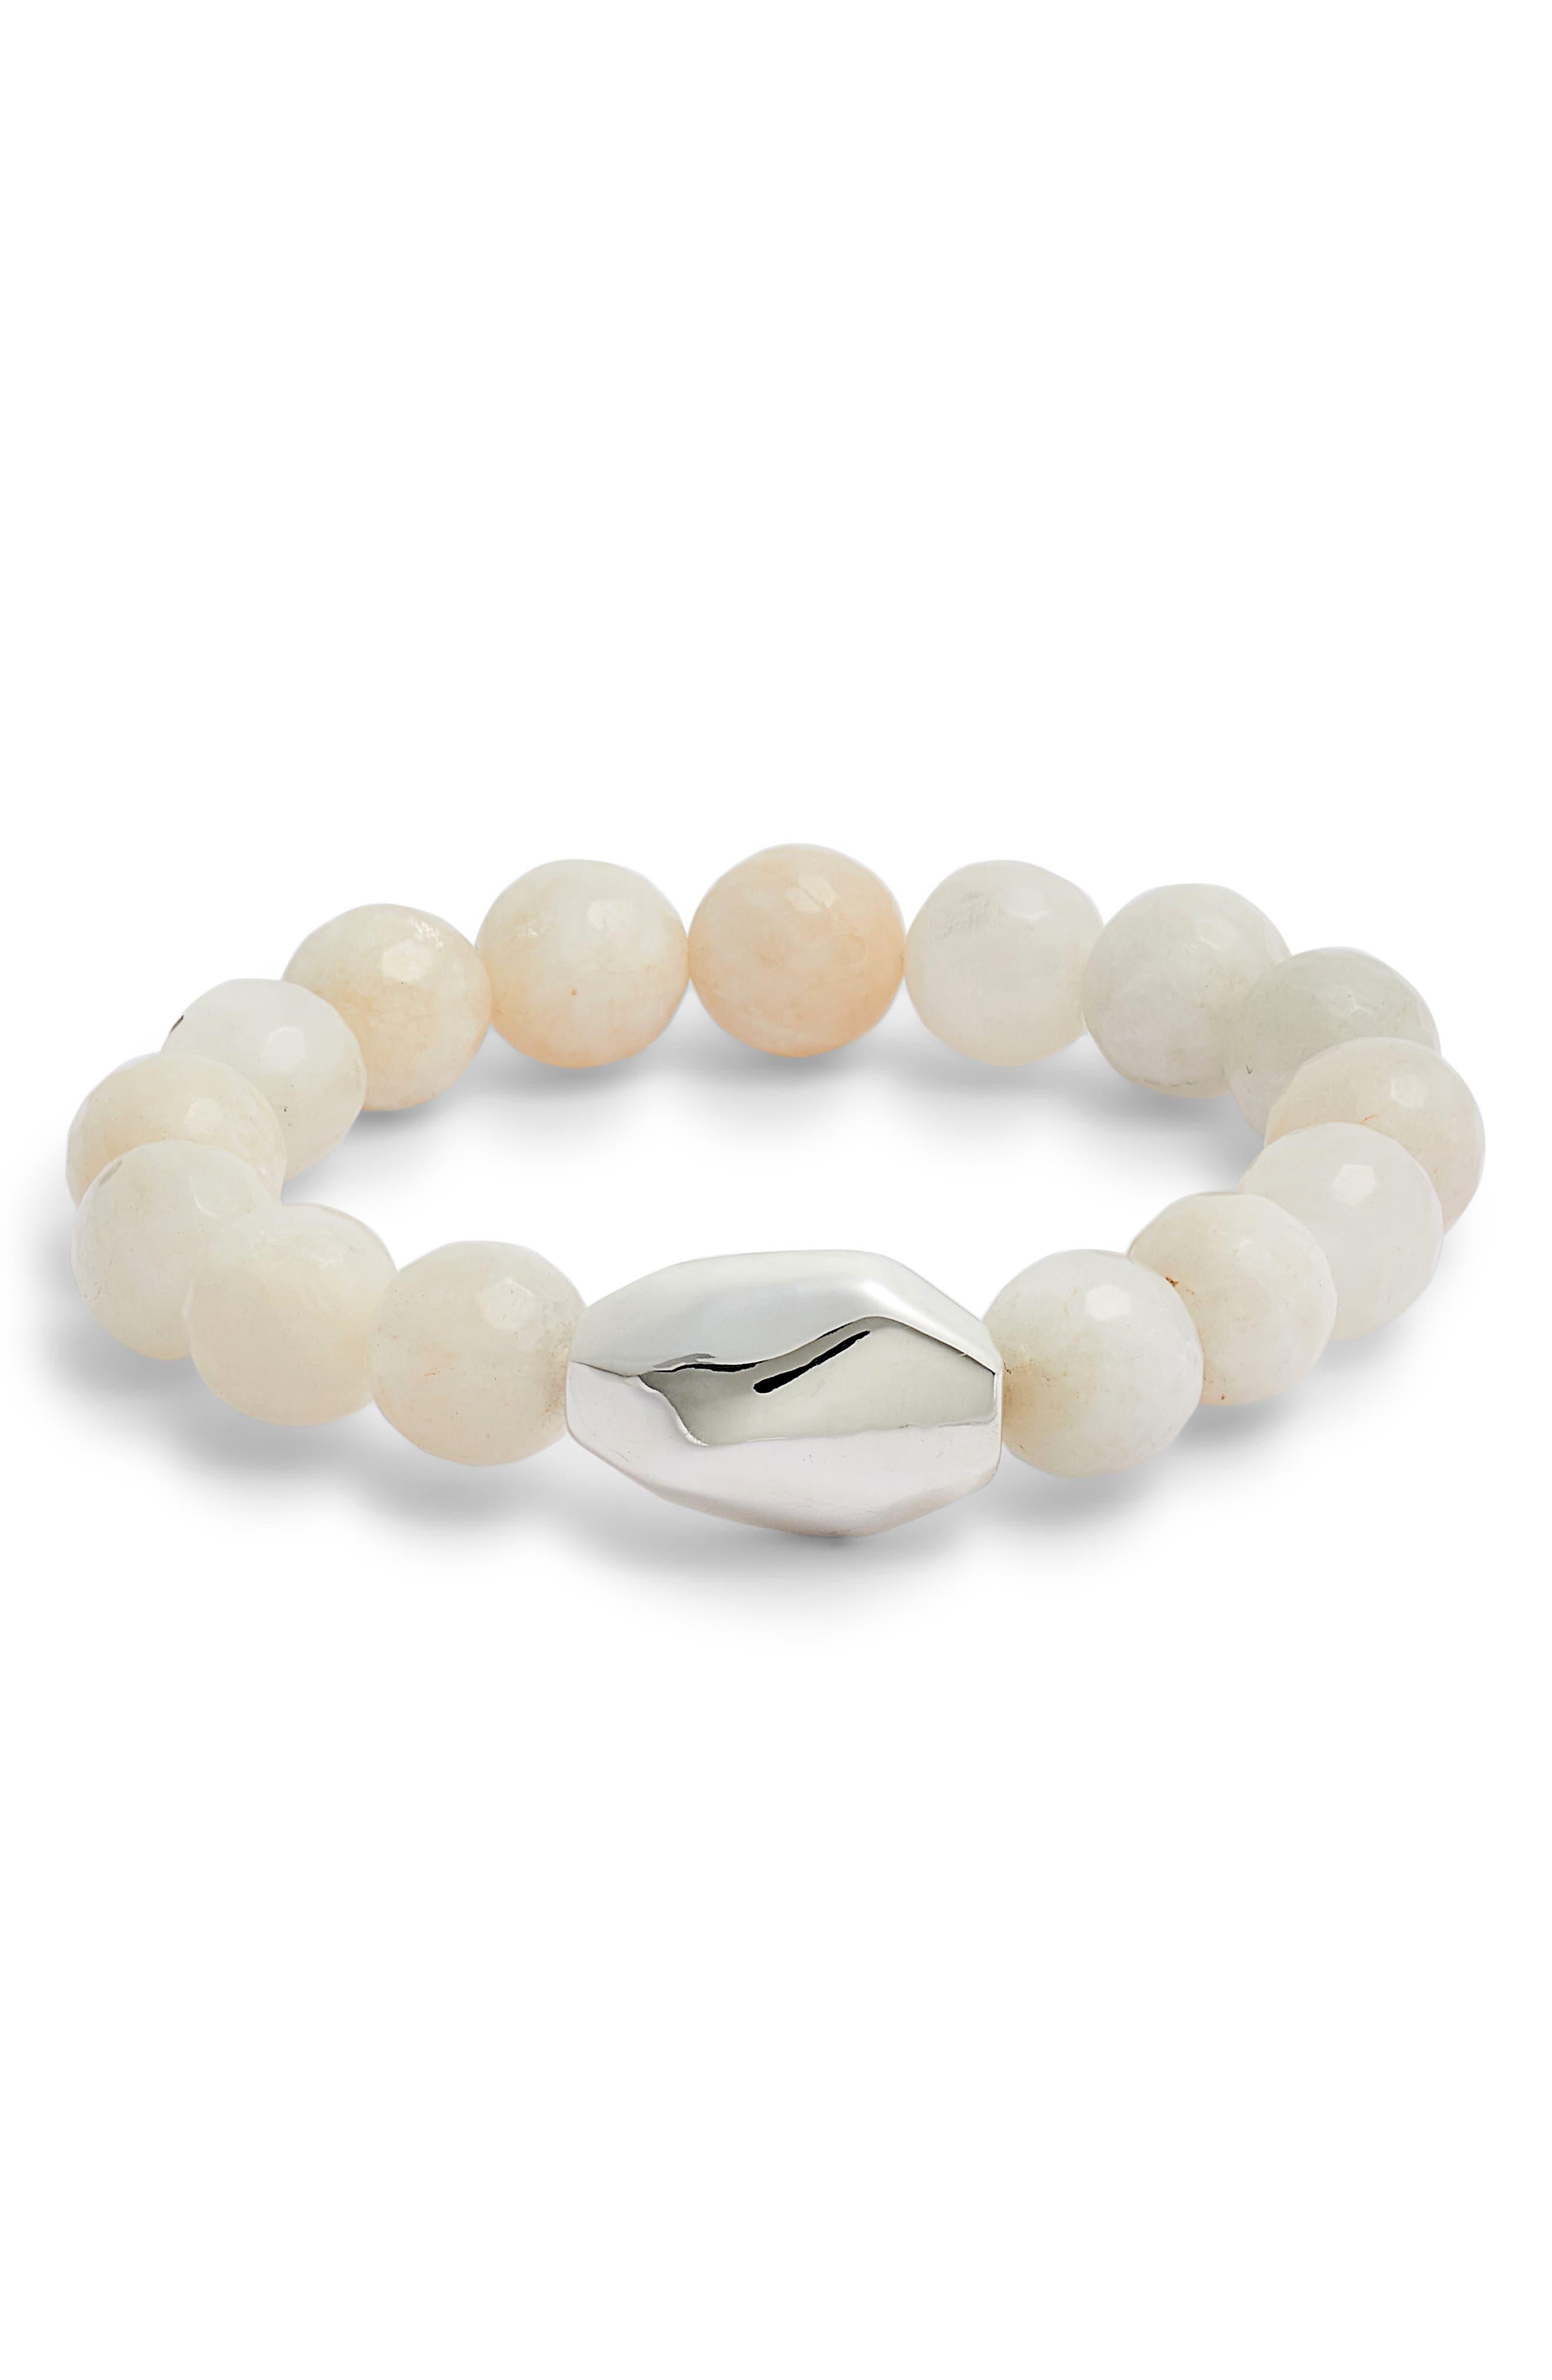 White Moonstone Stretch Bracelet,                         Main,                         color, 040